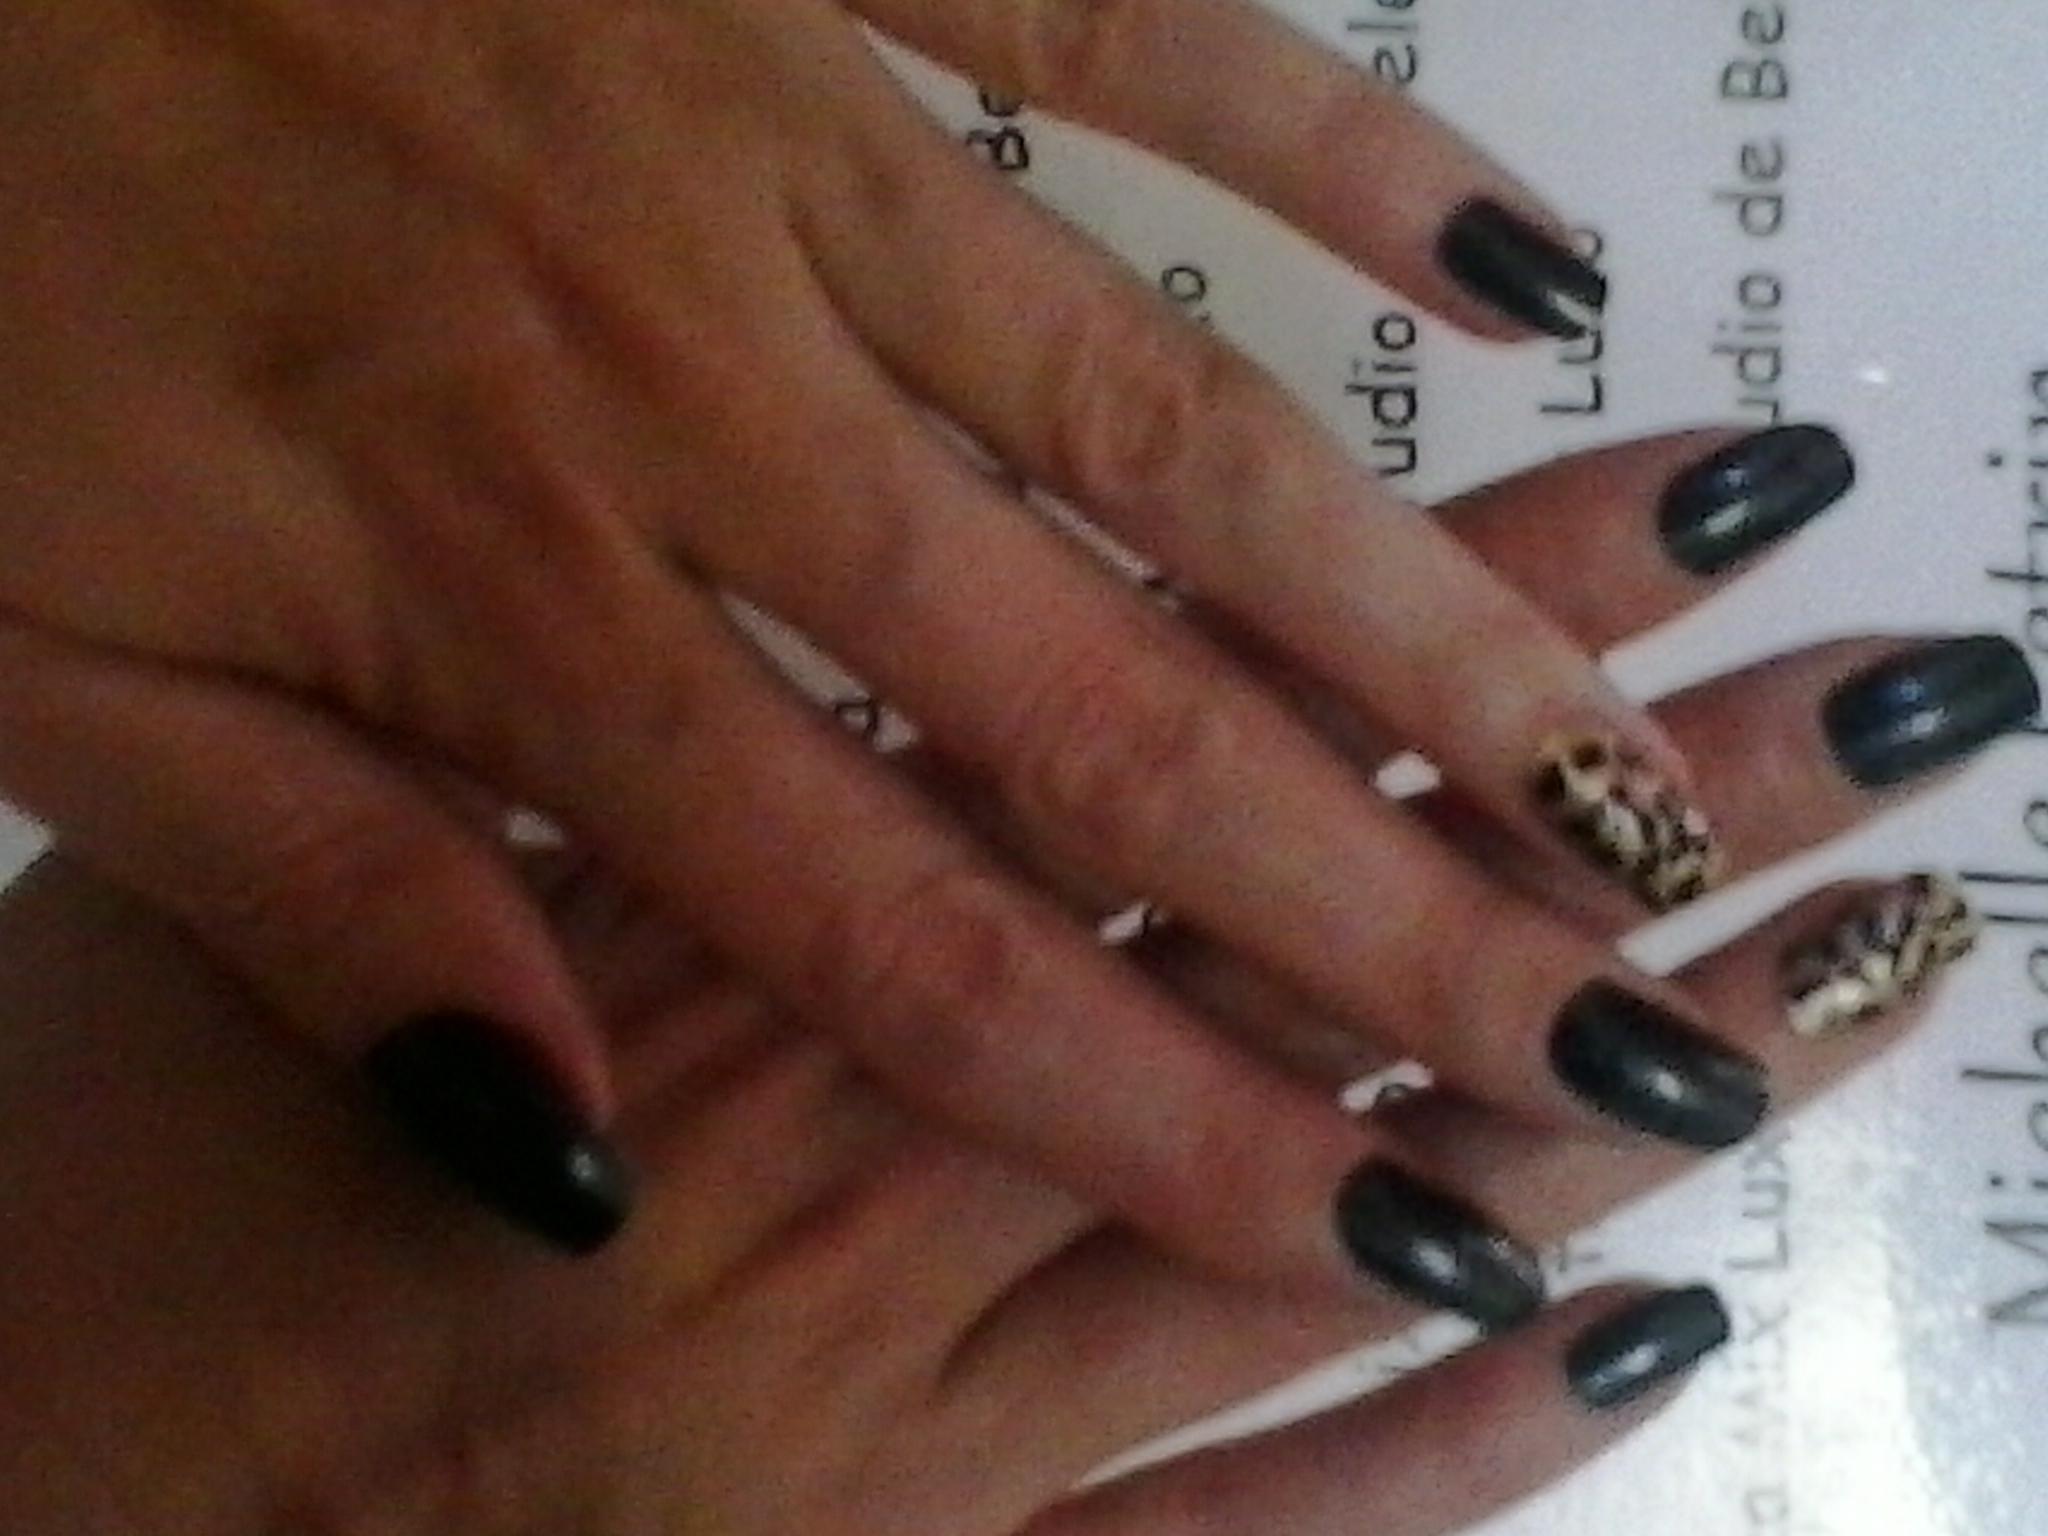 Unha artistica Unhas de oncinha. Manicure manicure e pedicure designer de sobrancelhas maquiador(a) micropigmentador(a)